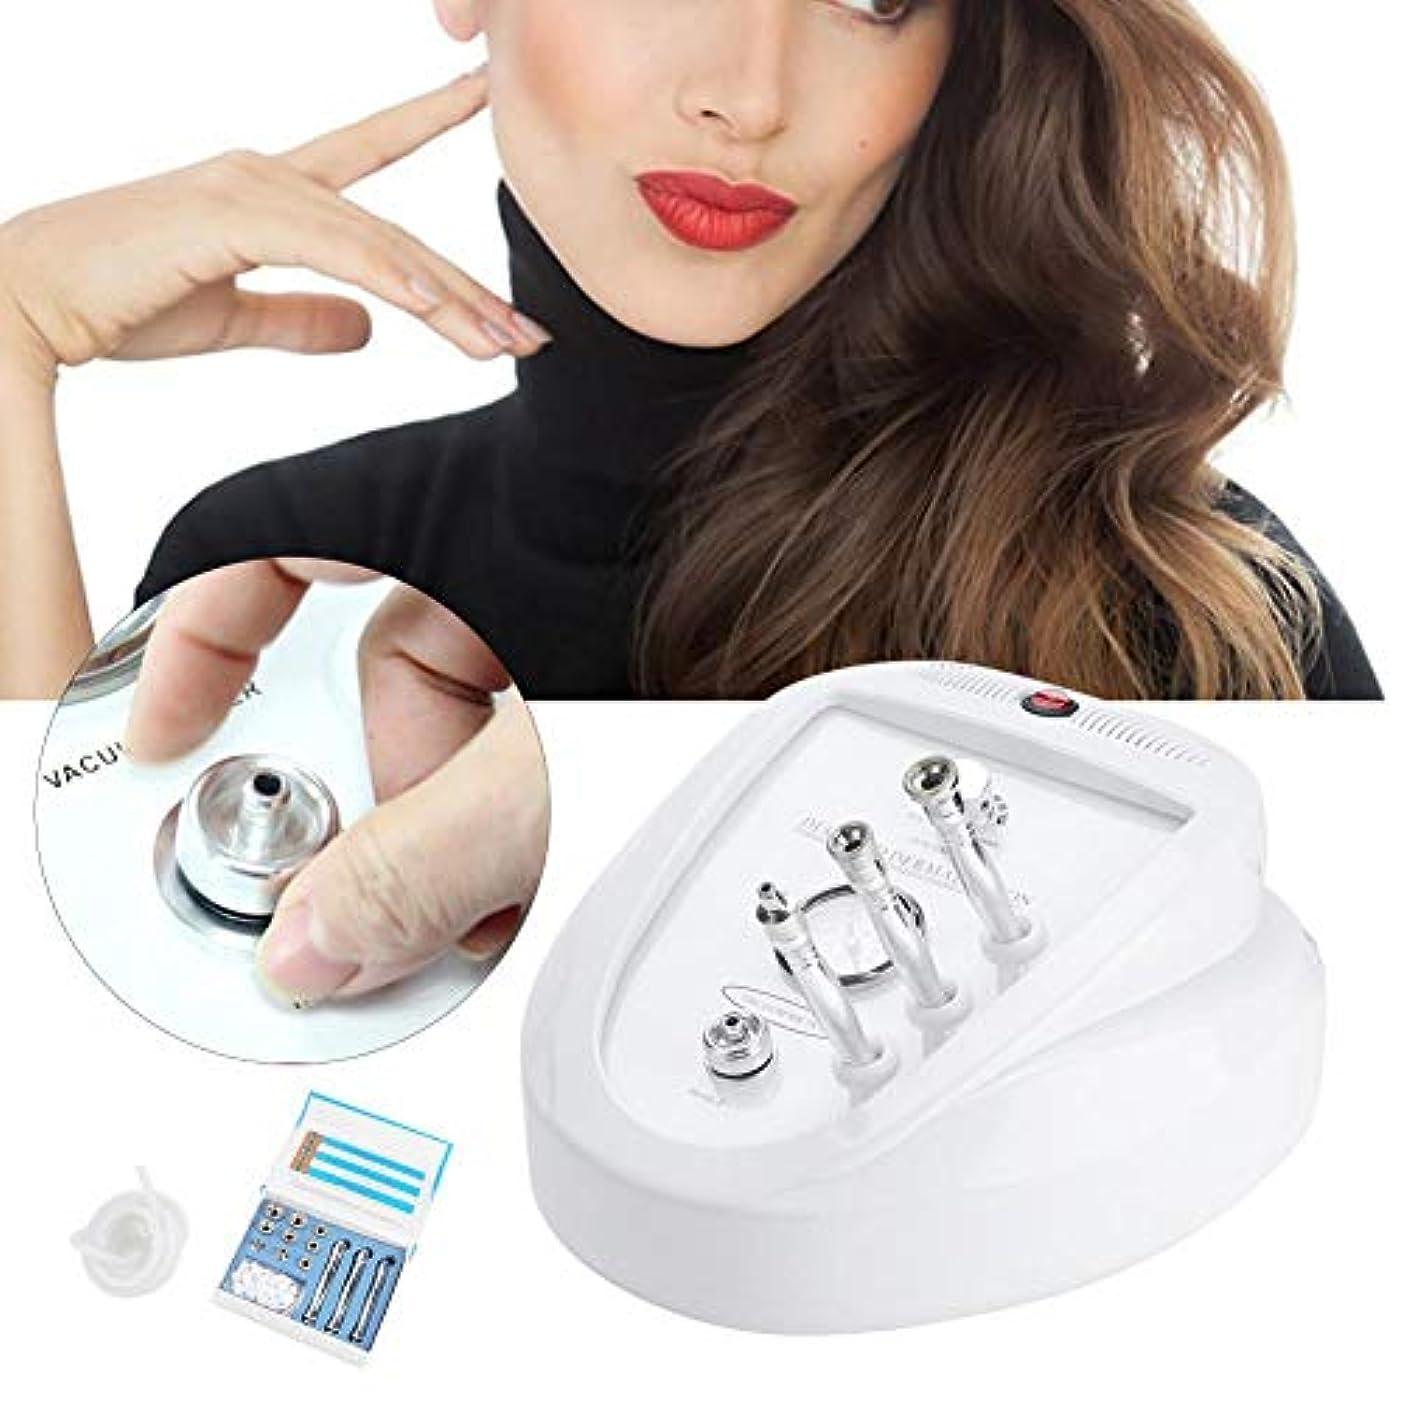 3 in 1ダイヤモンド皮膚剥離機、肌の若返り装置、フェイスリフティングマイクロマッサージエクスフォリエーター用プロのサロン&家庭用ディープクレンジングホワイトニングスキンピーリングシワ削除